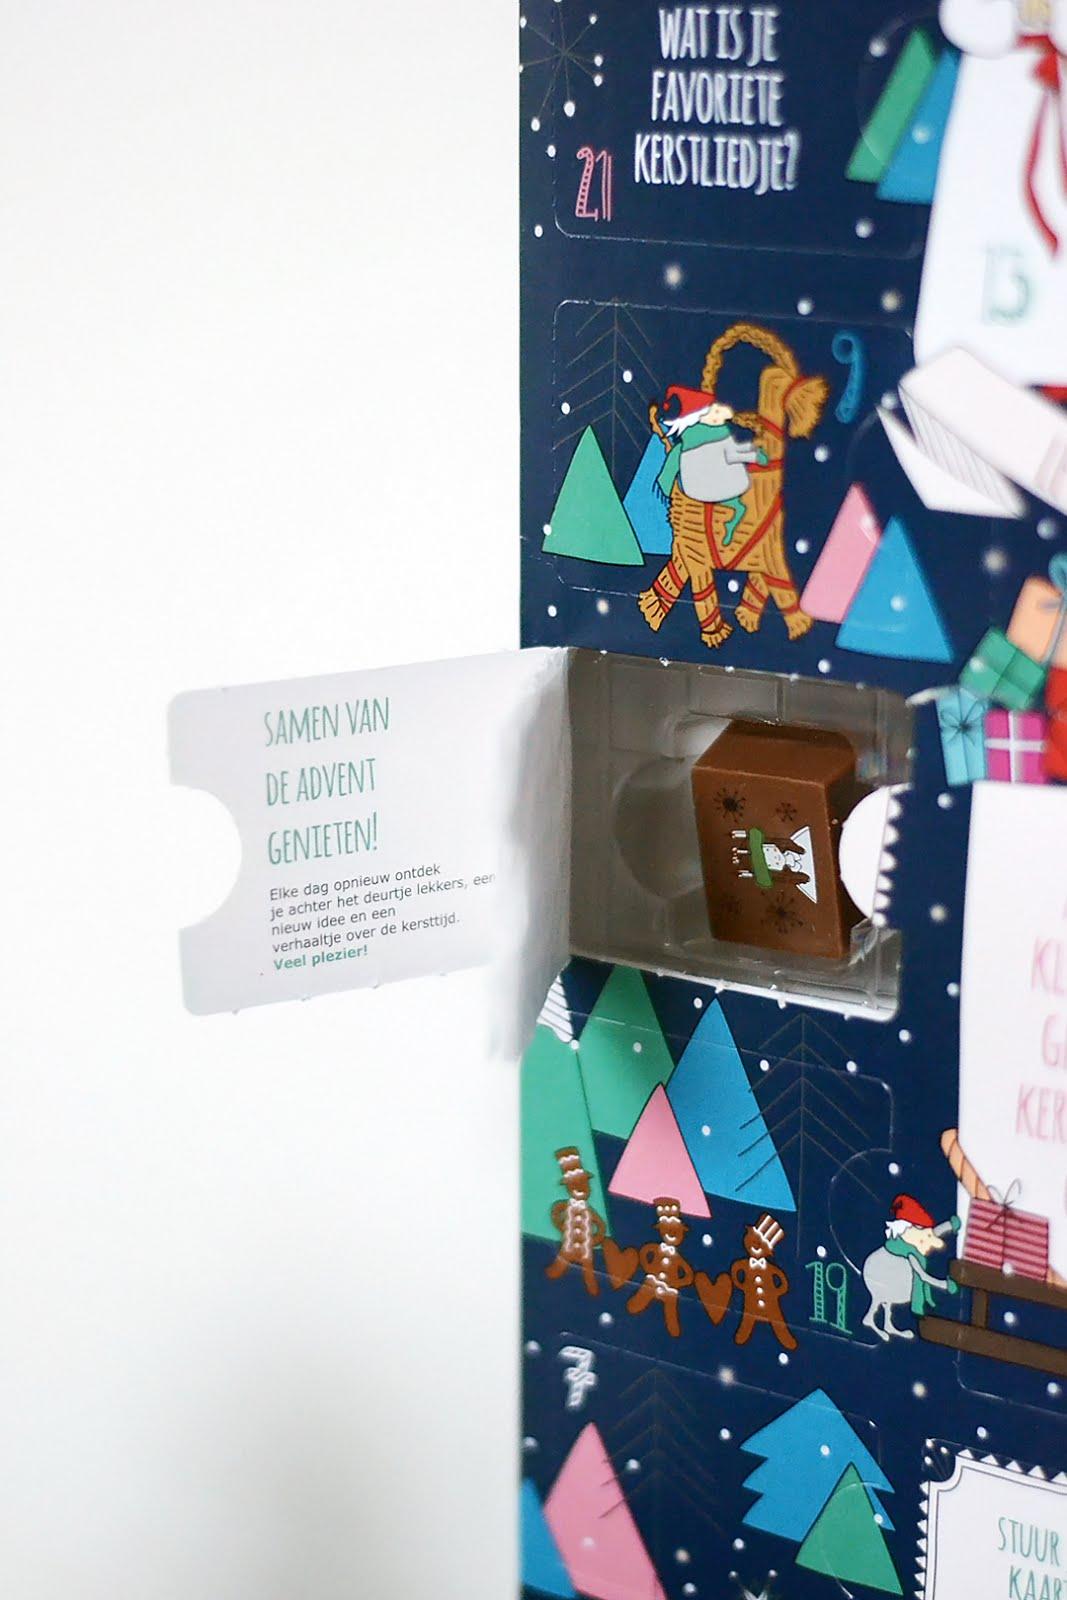 Ikea, adventskalender, advent calendar, coupon, gift, discount, christmas, vinter 2016